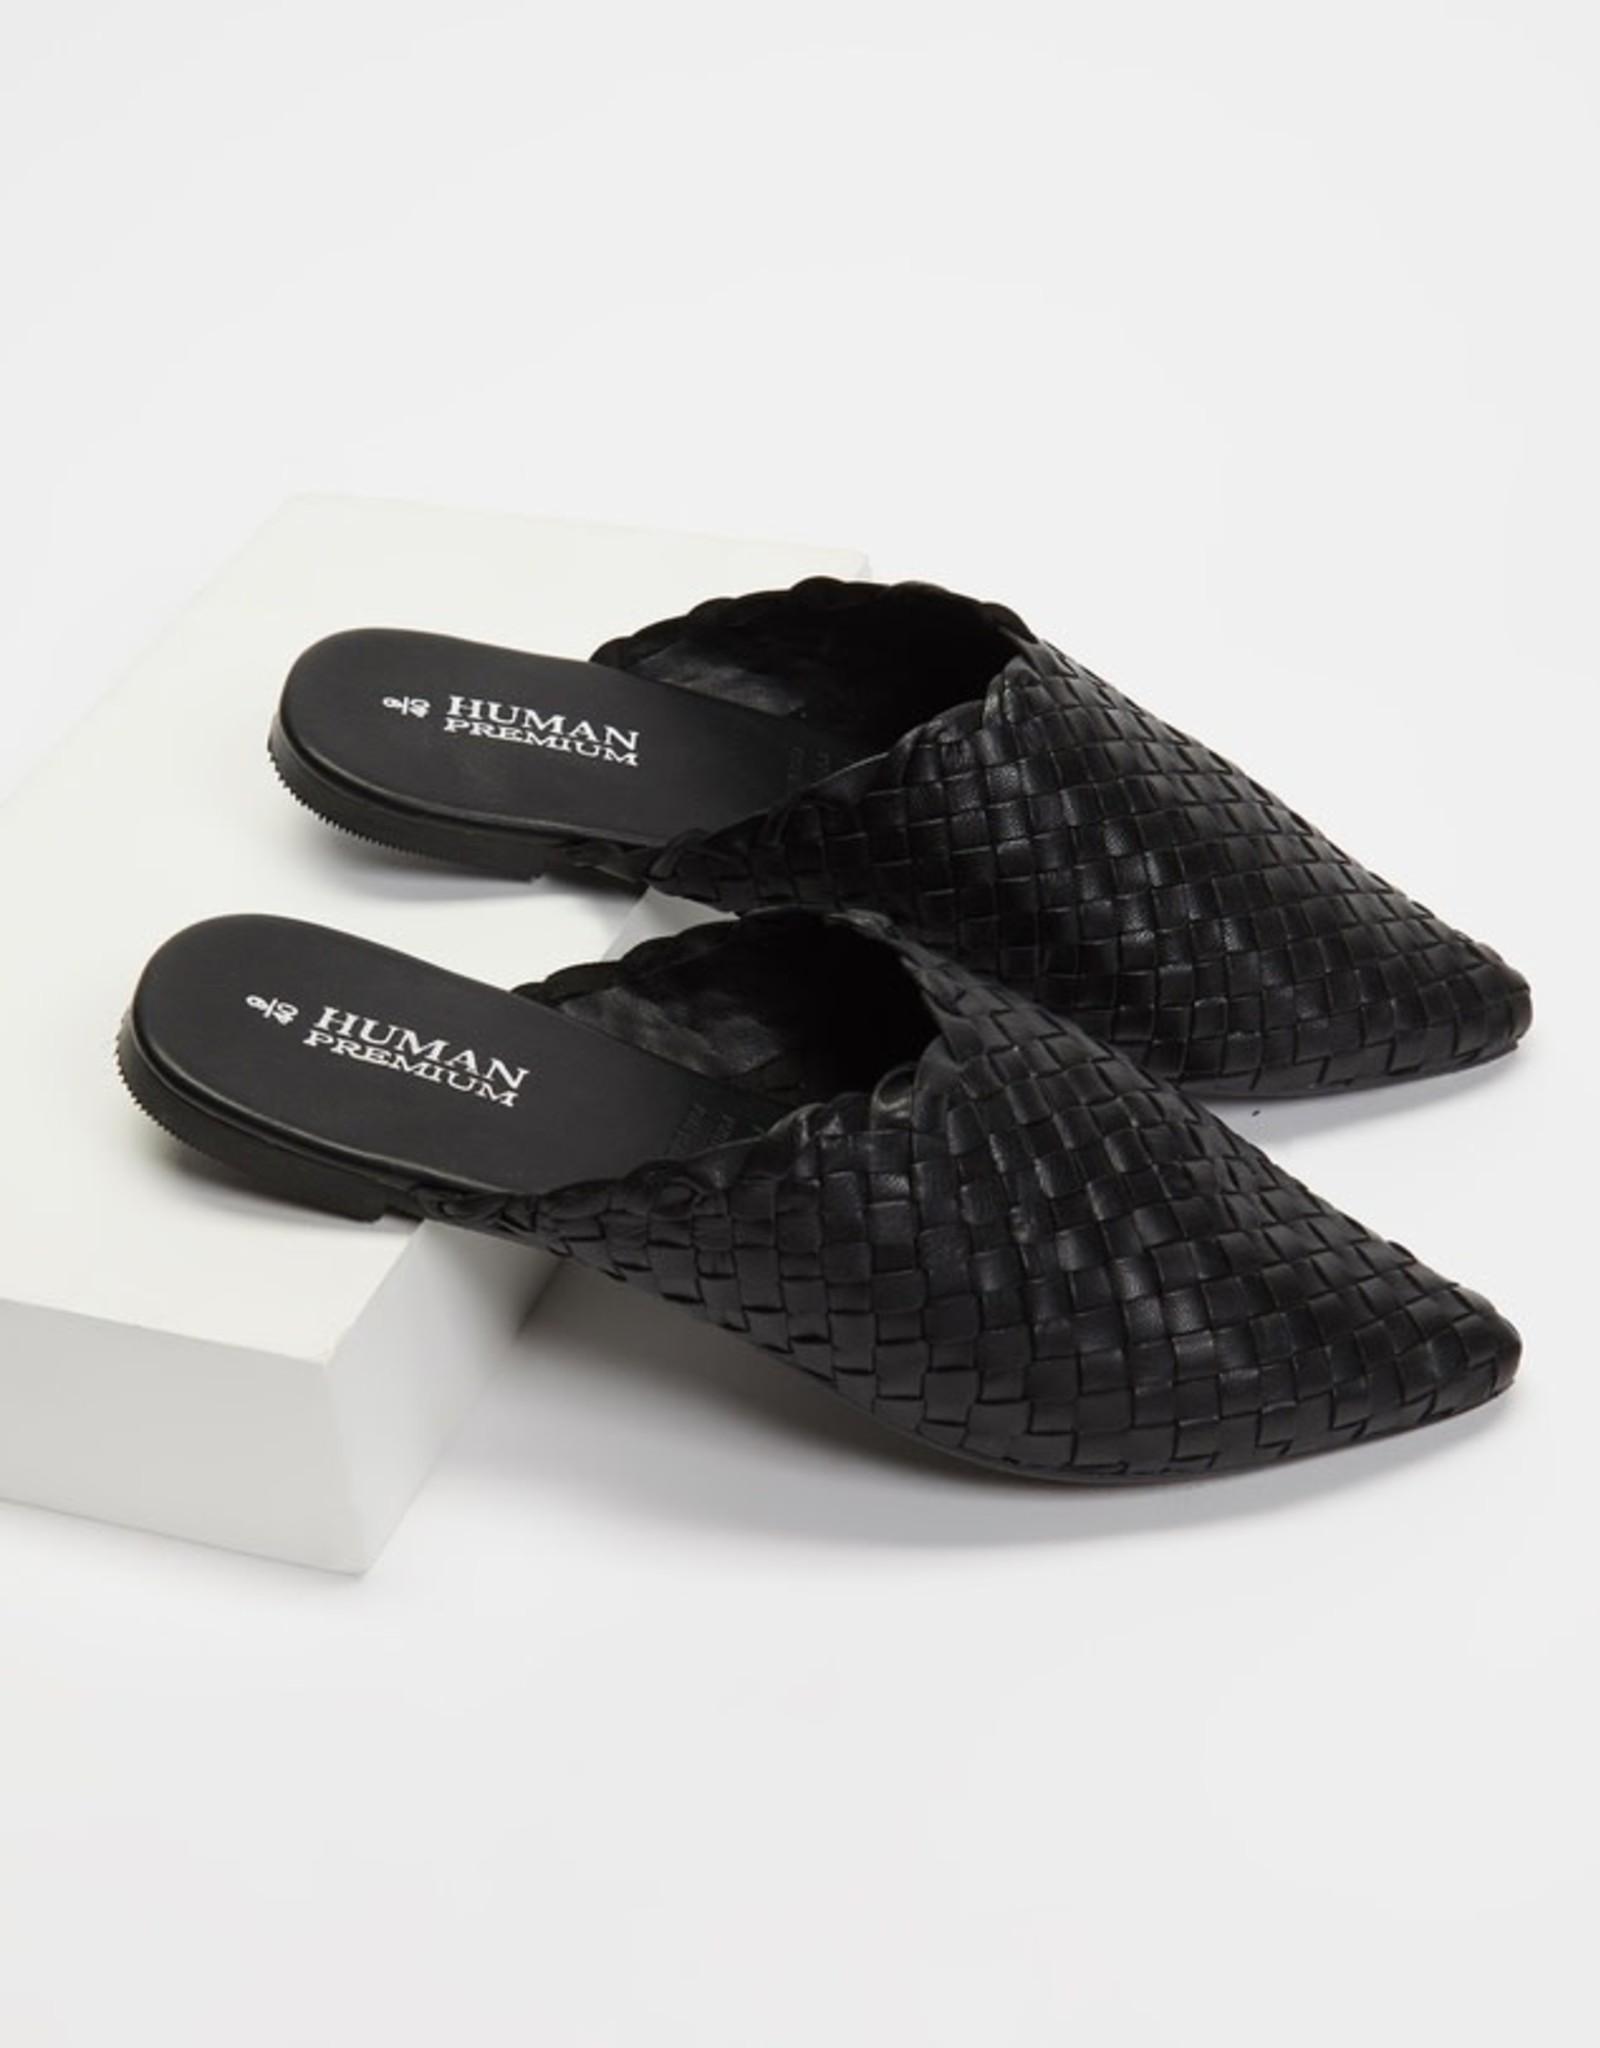 HUMAN Human Shoes - Mojo Leather Slide (Black & Natural)